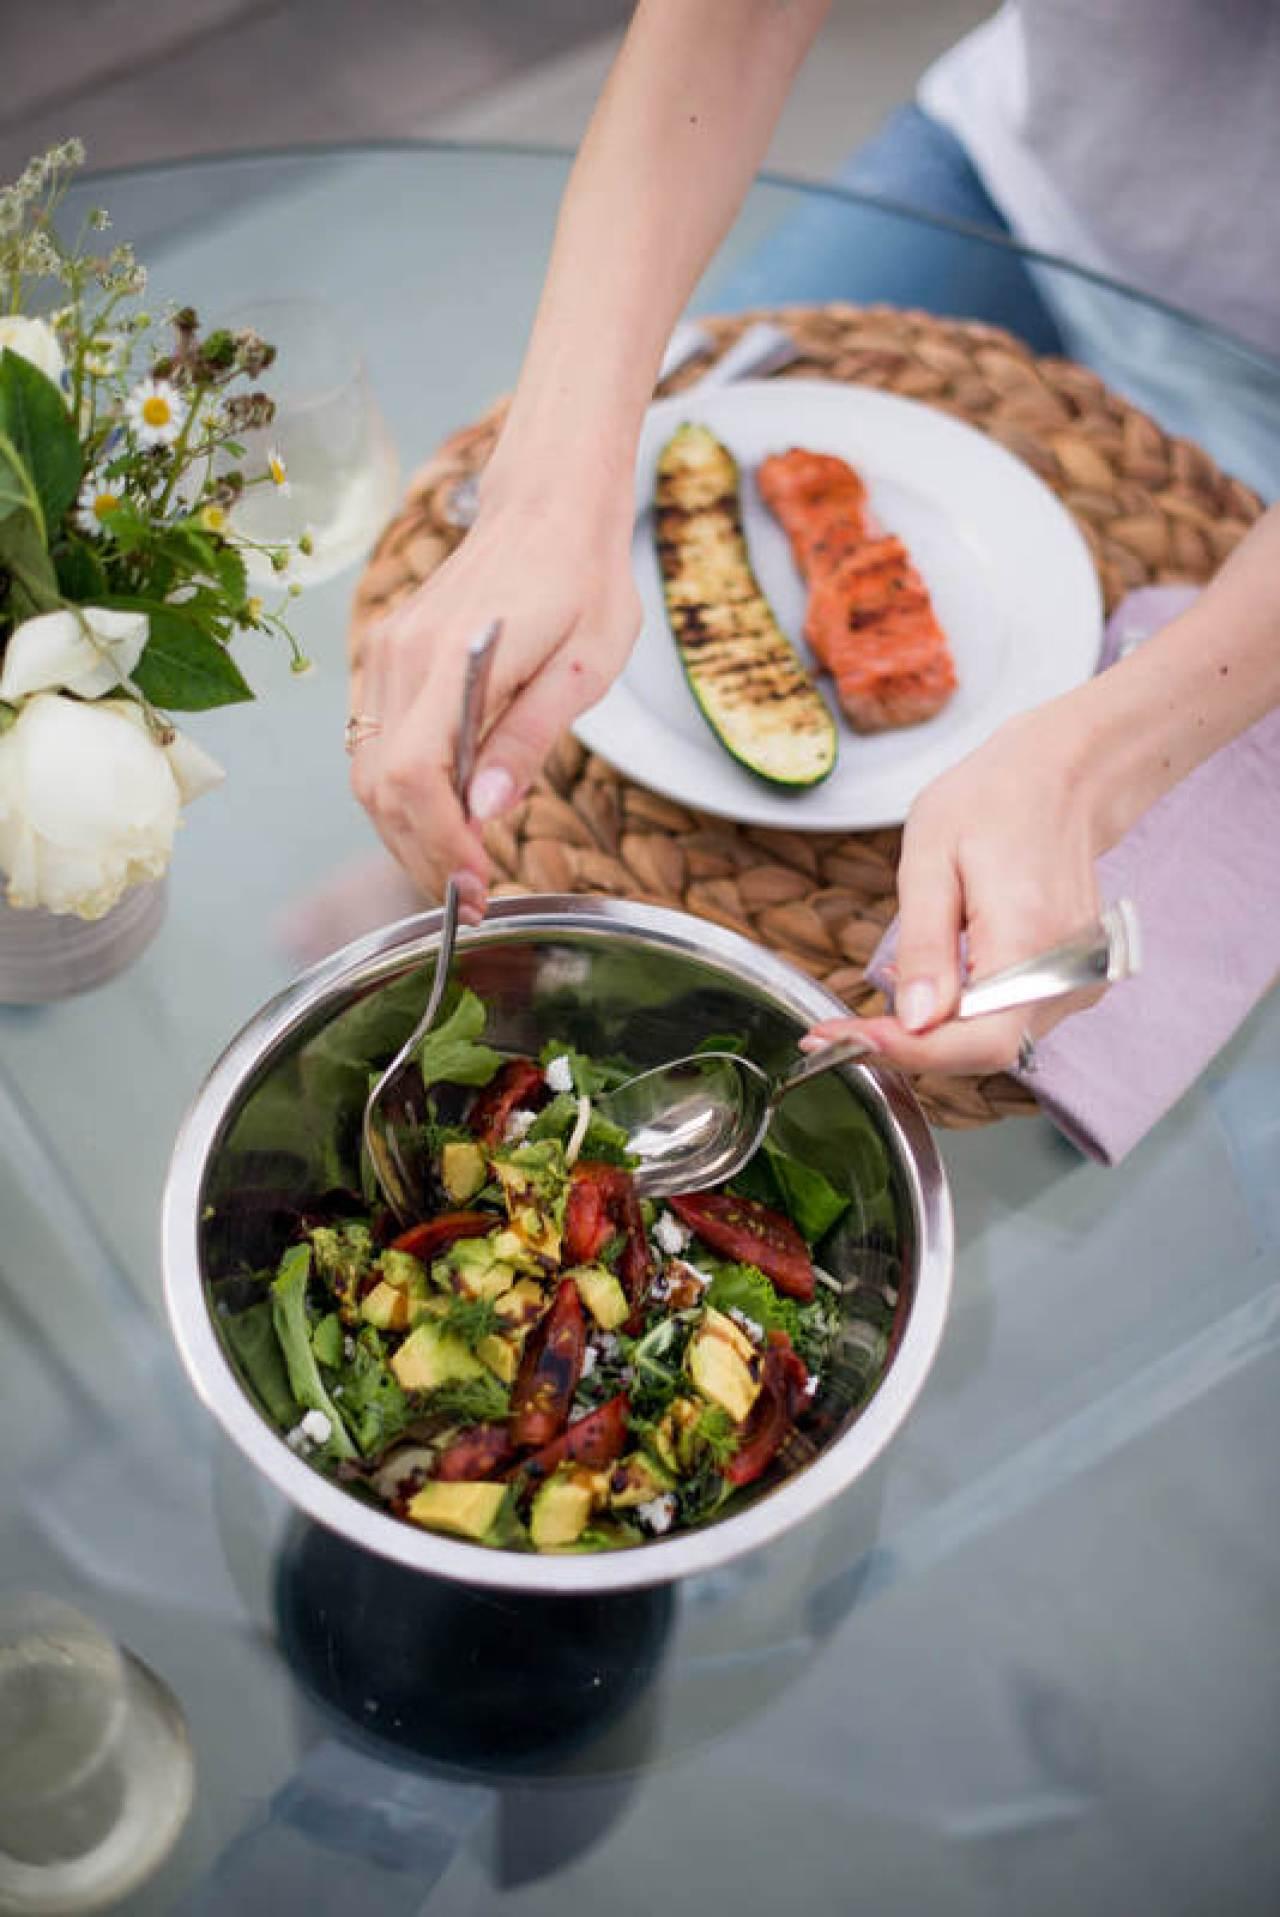 the best summer salad - lettuce, tomatoes, avocado, feta